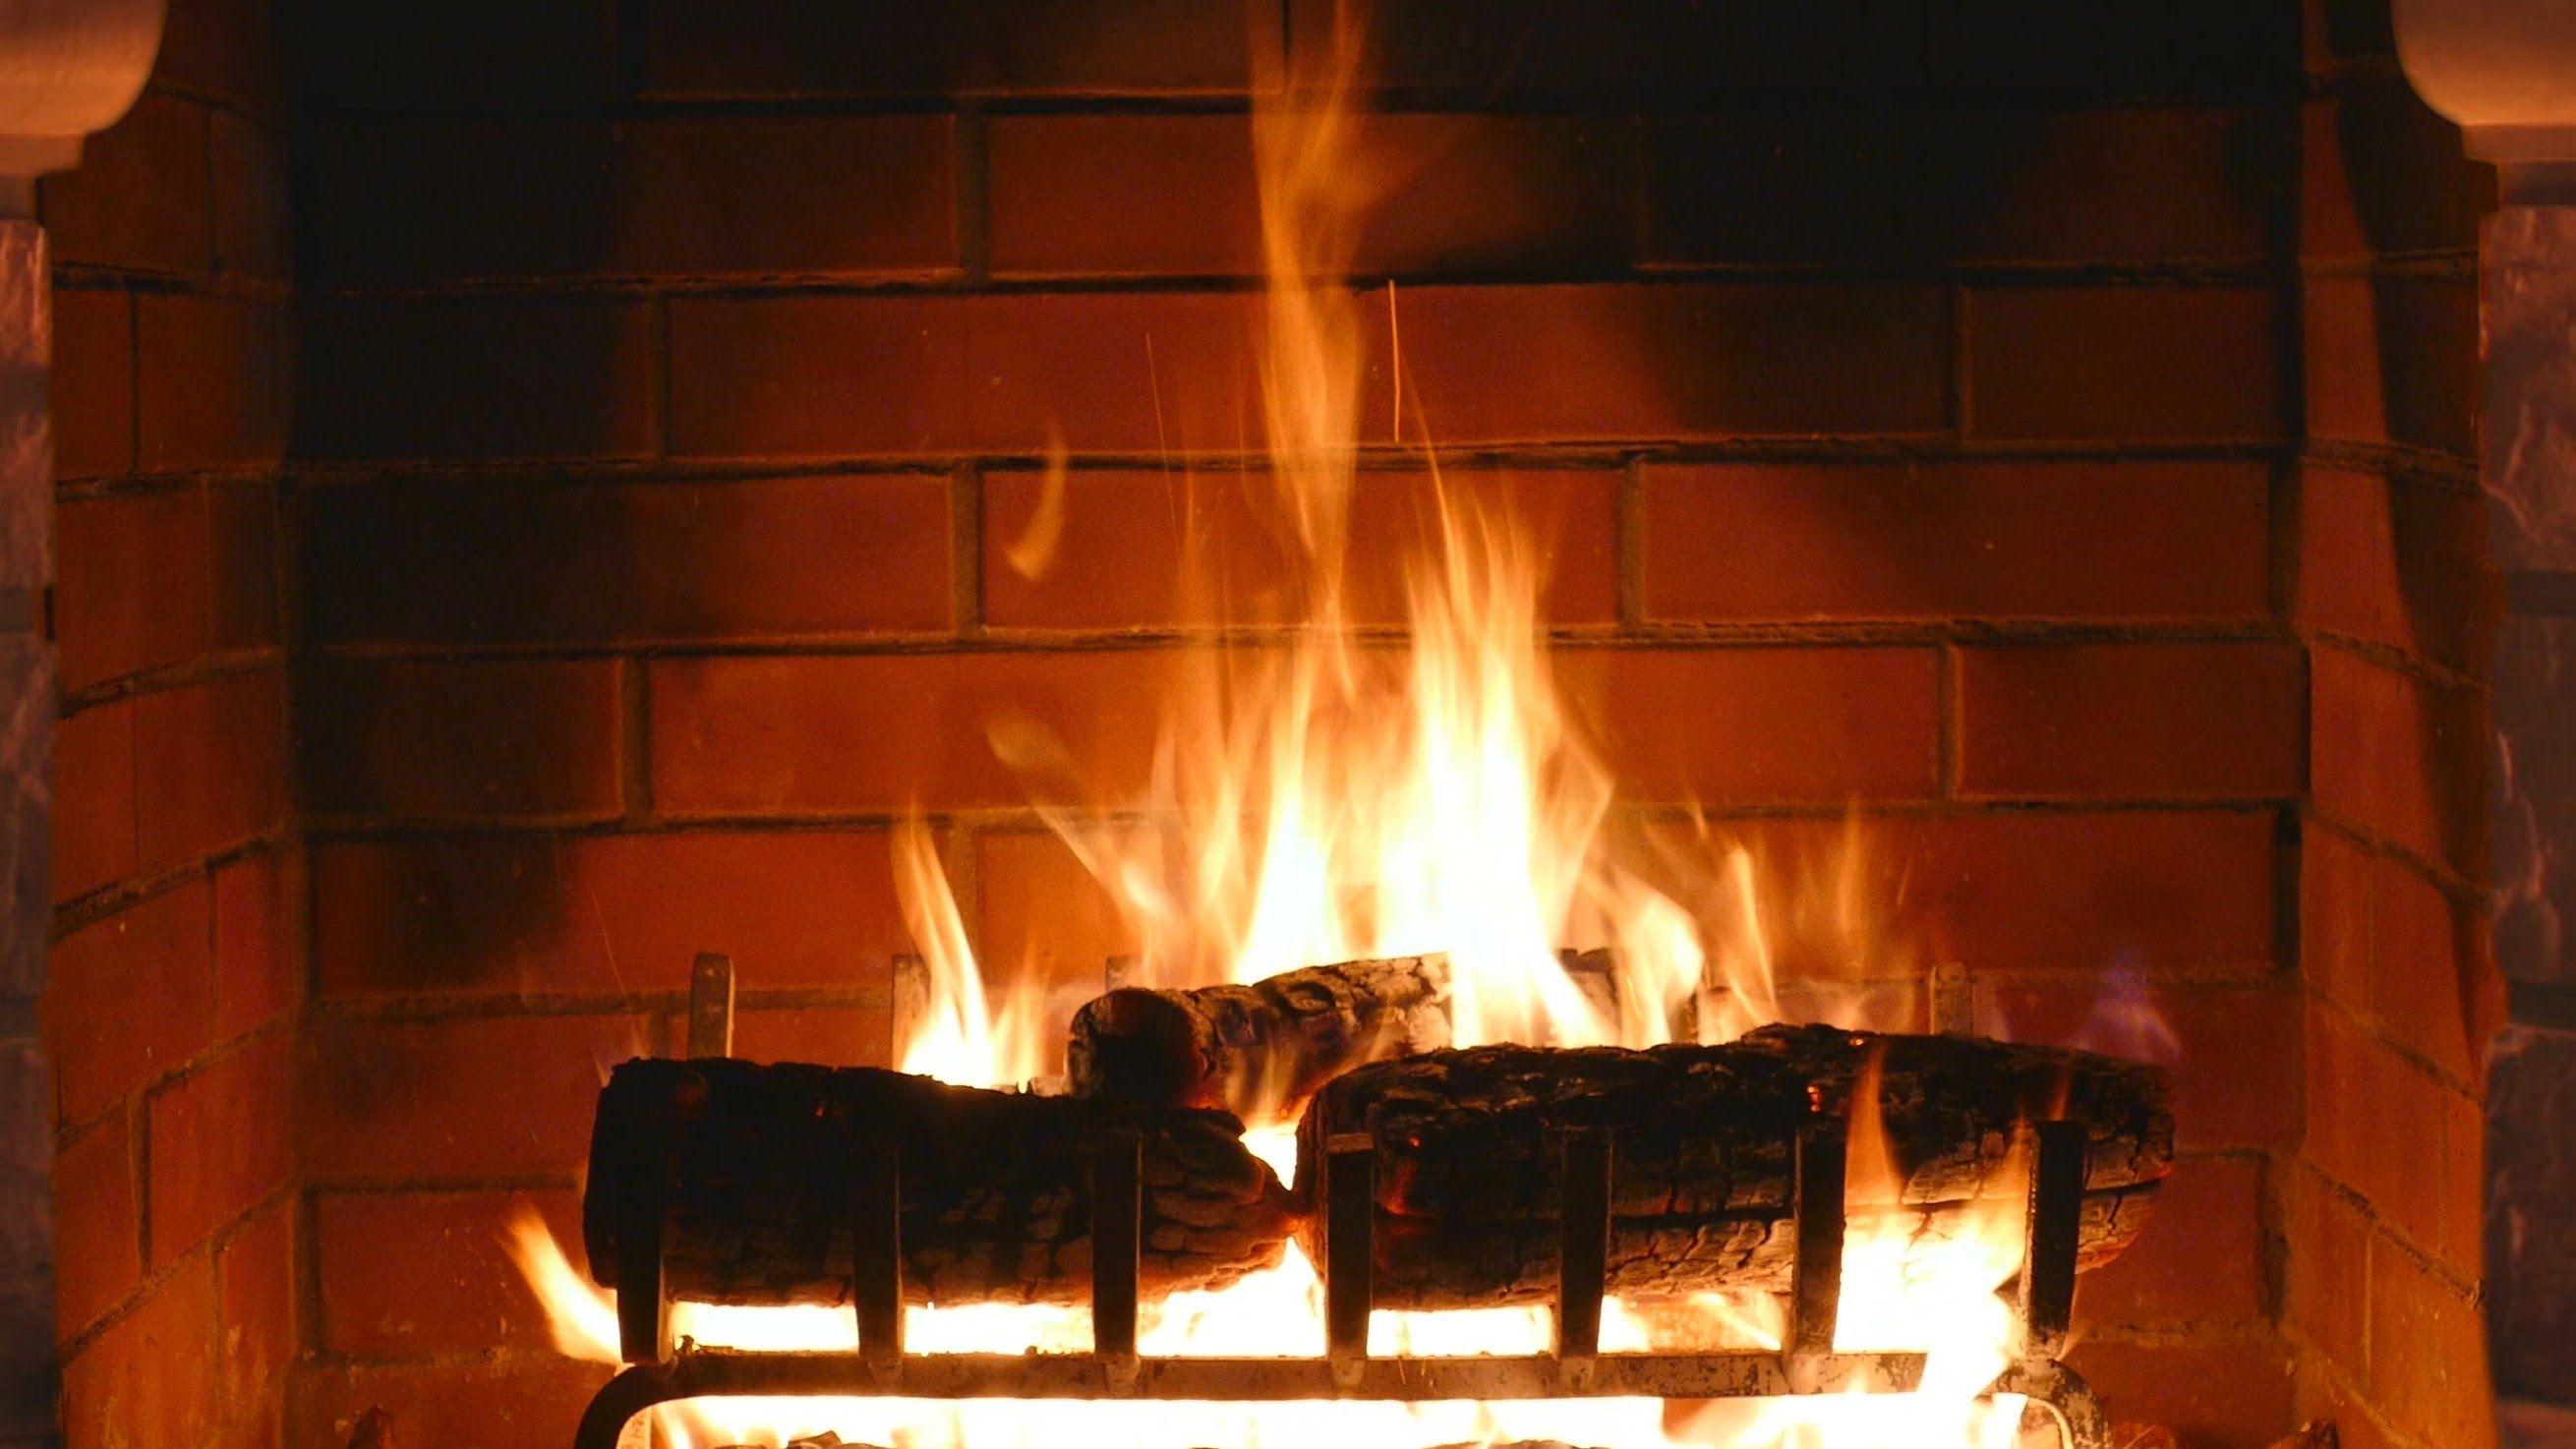 Fireplace Screensaver Virtual Fireplace For Tv In Full Hd 8 Hours Fireplace Screensaver Fireplace Virtual Fireplace